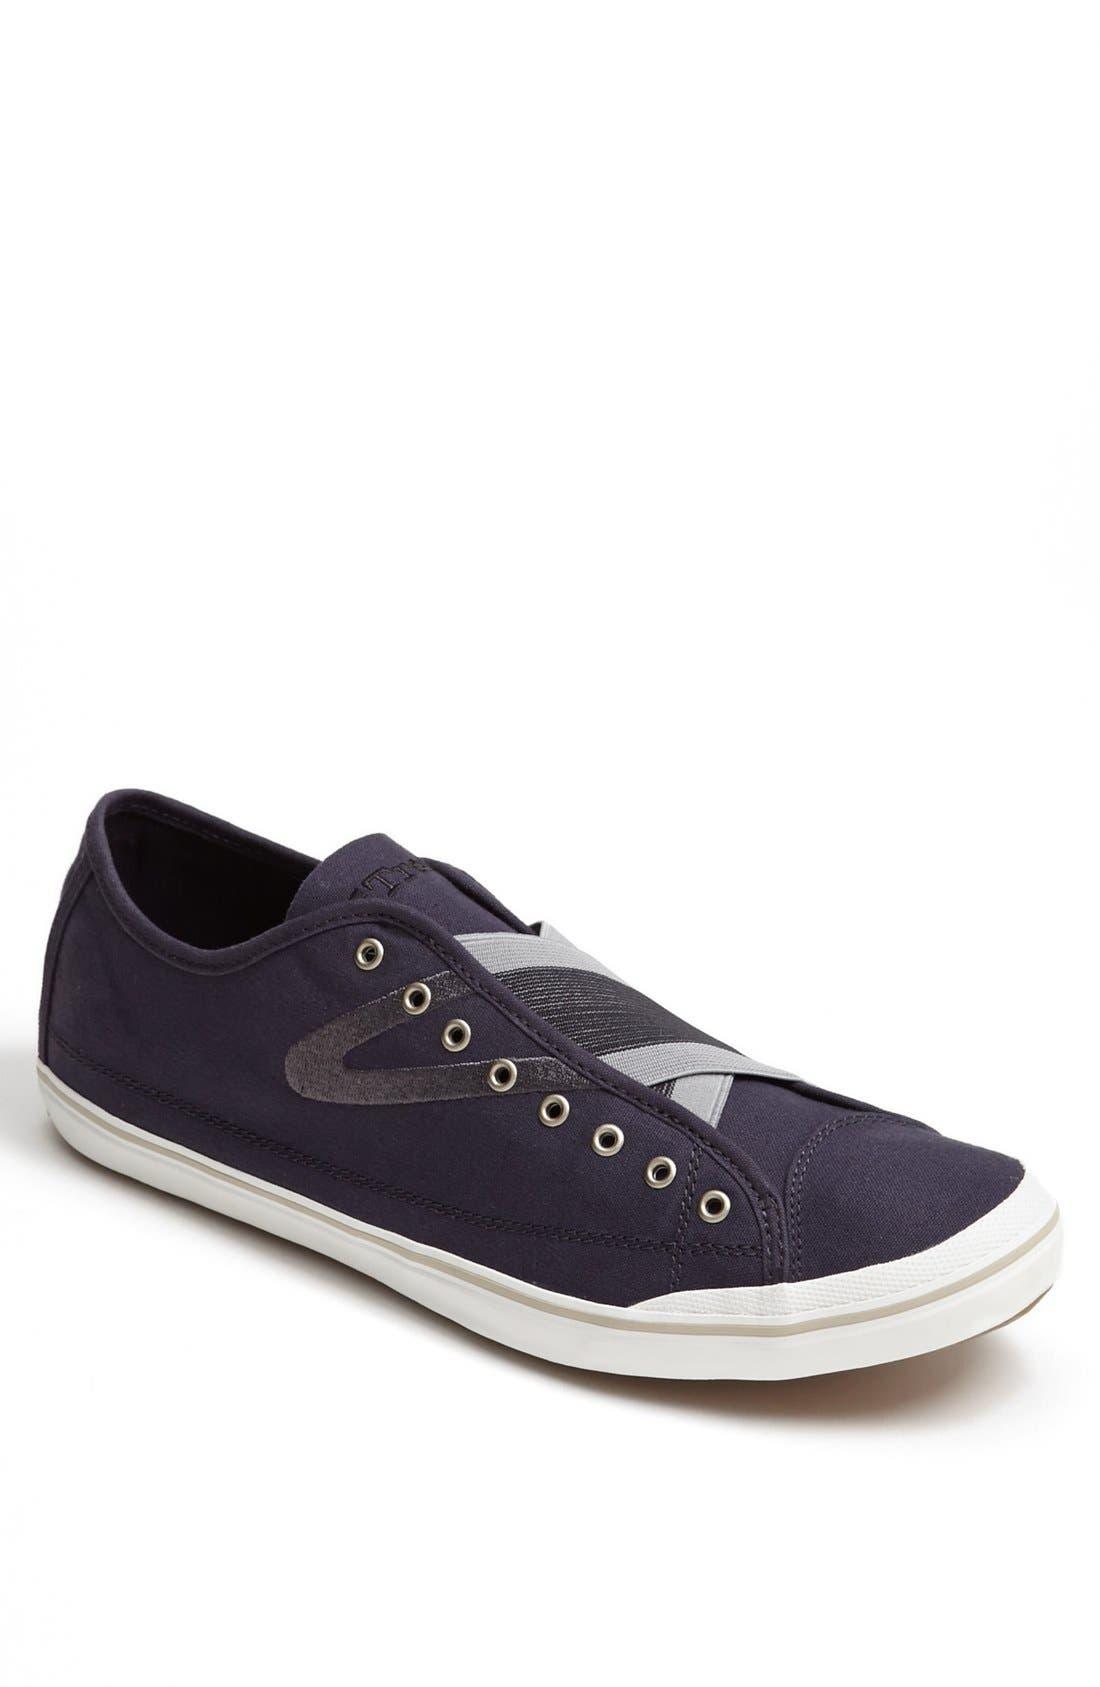 Alternate Image 1 Selected - Tretorn 'Skymra' Sneaker (Men)